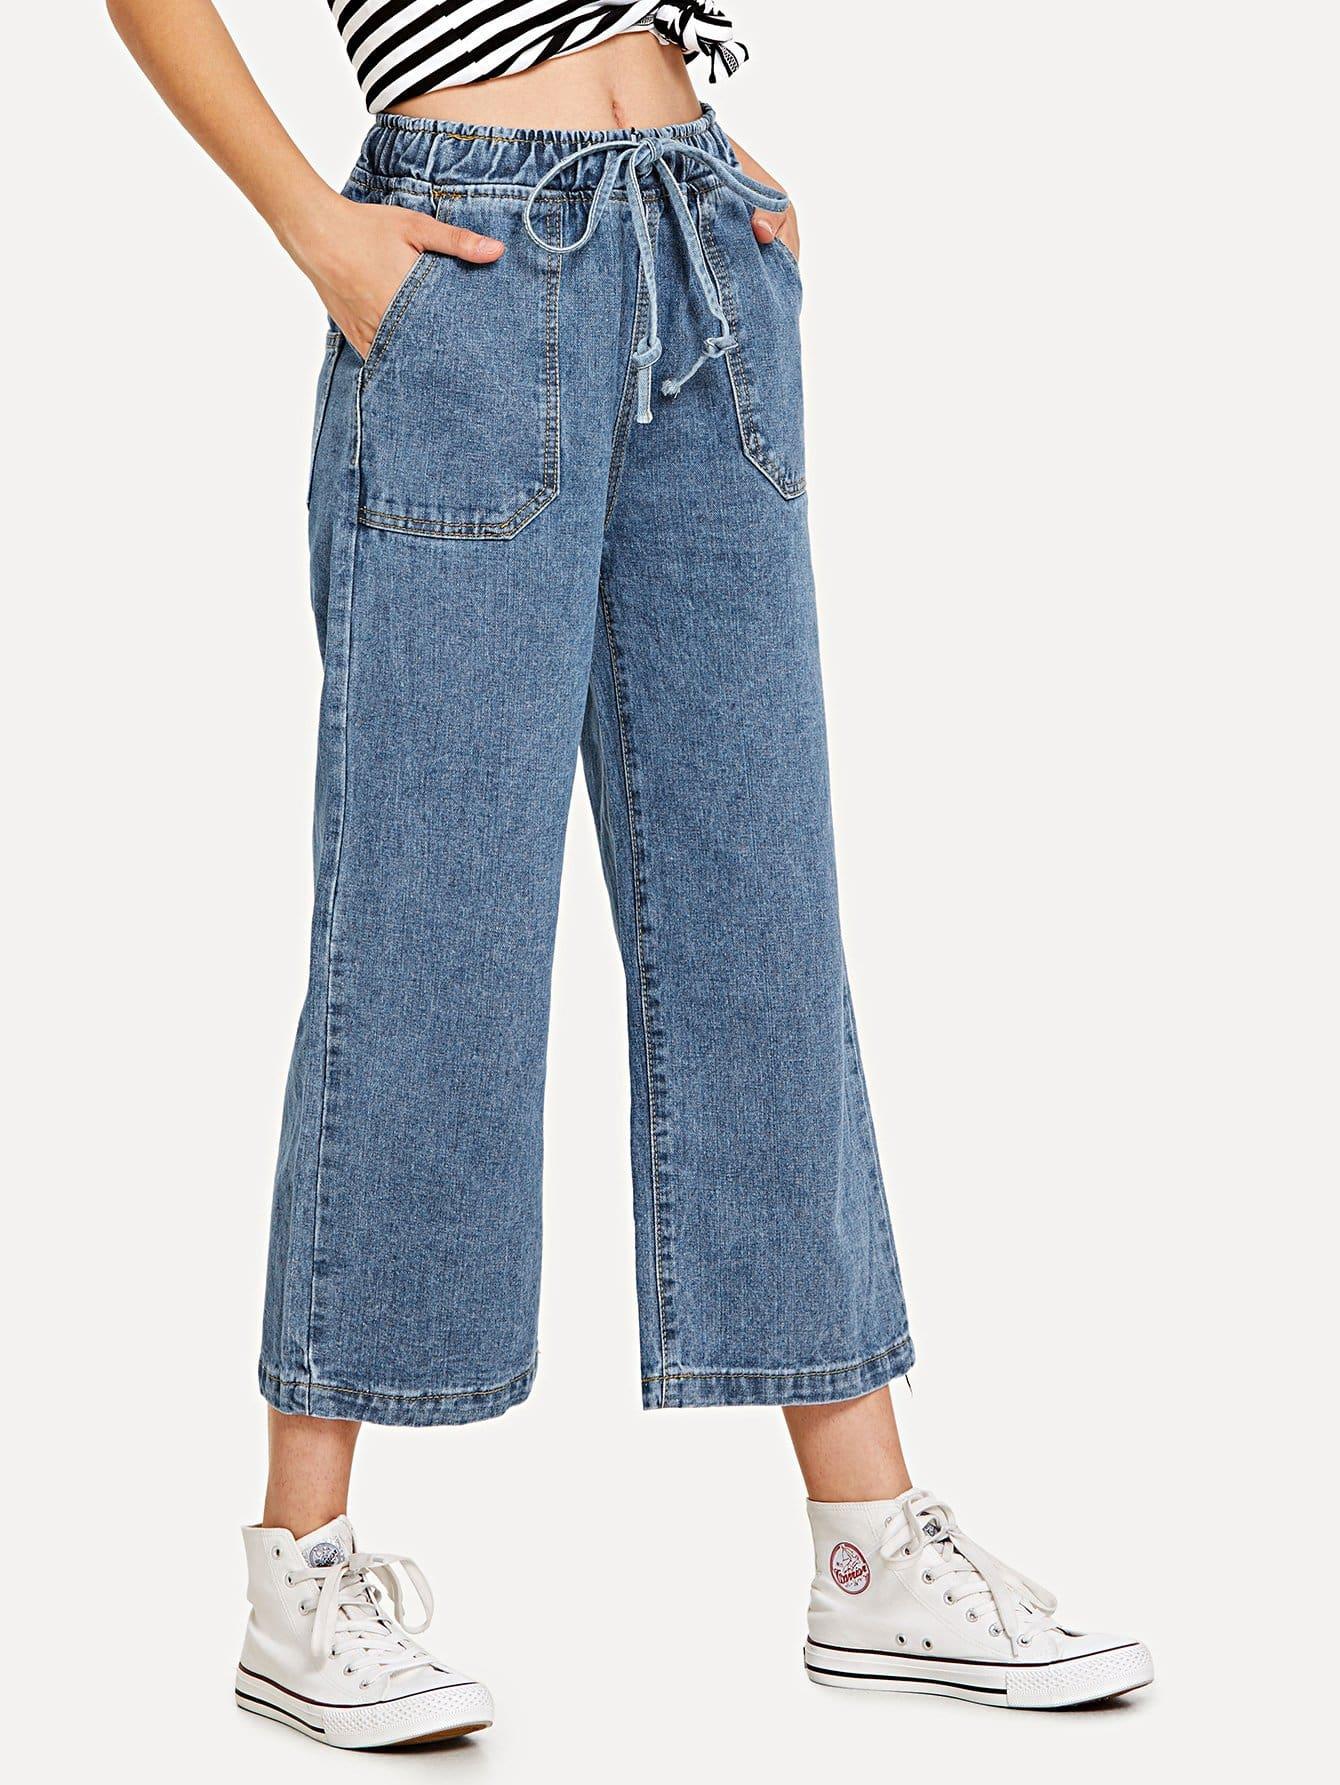 Drawstring Waist Wide Leg Jeans drawstring waist tapered leg jogger